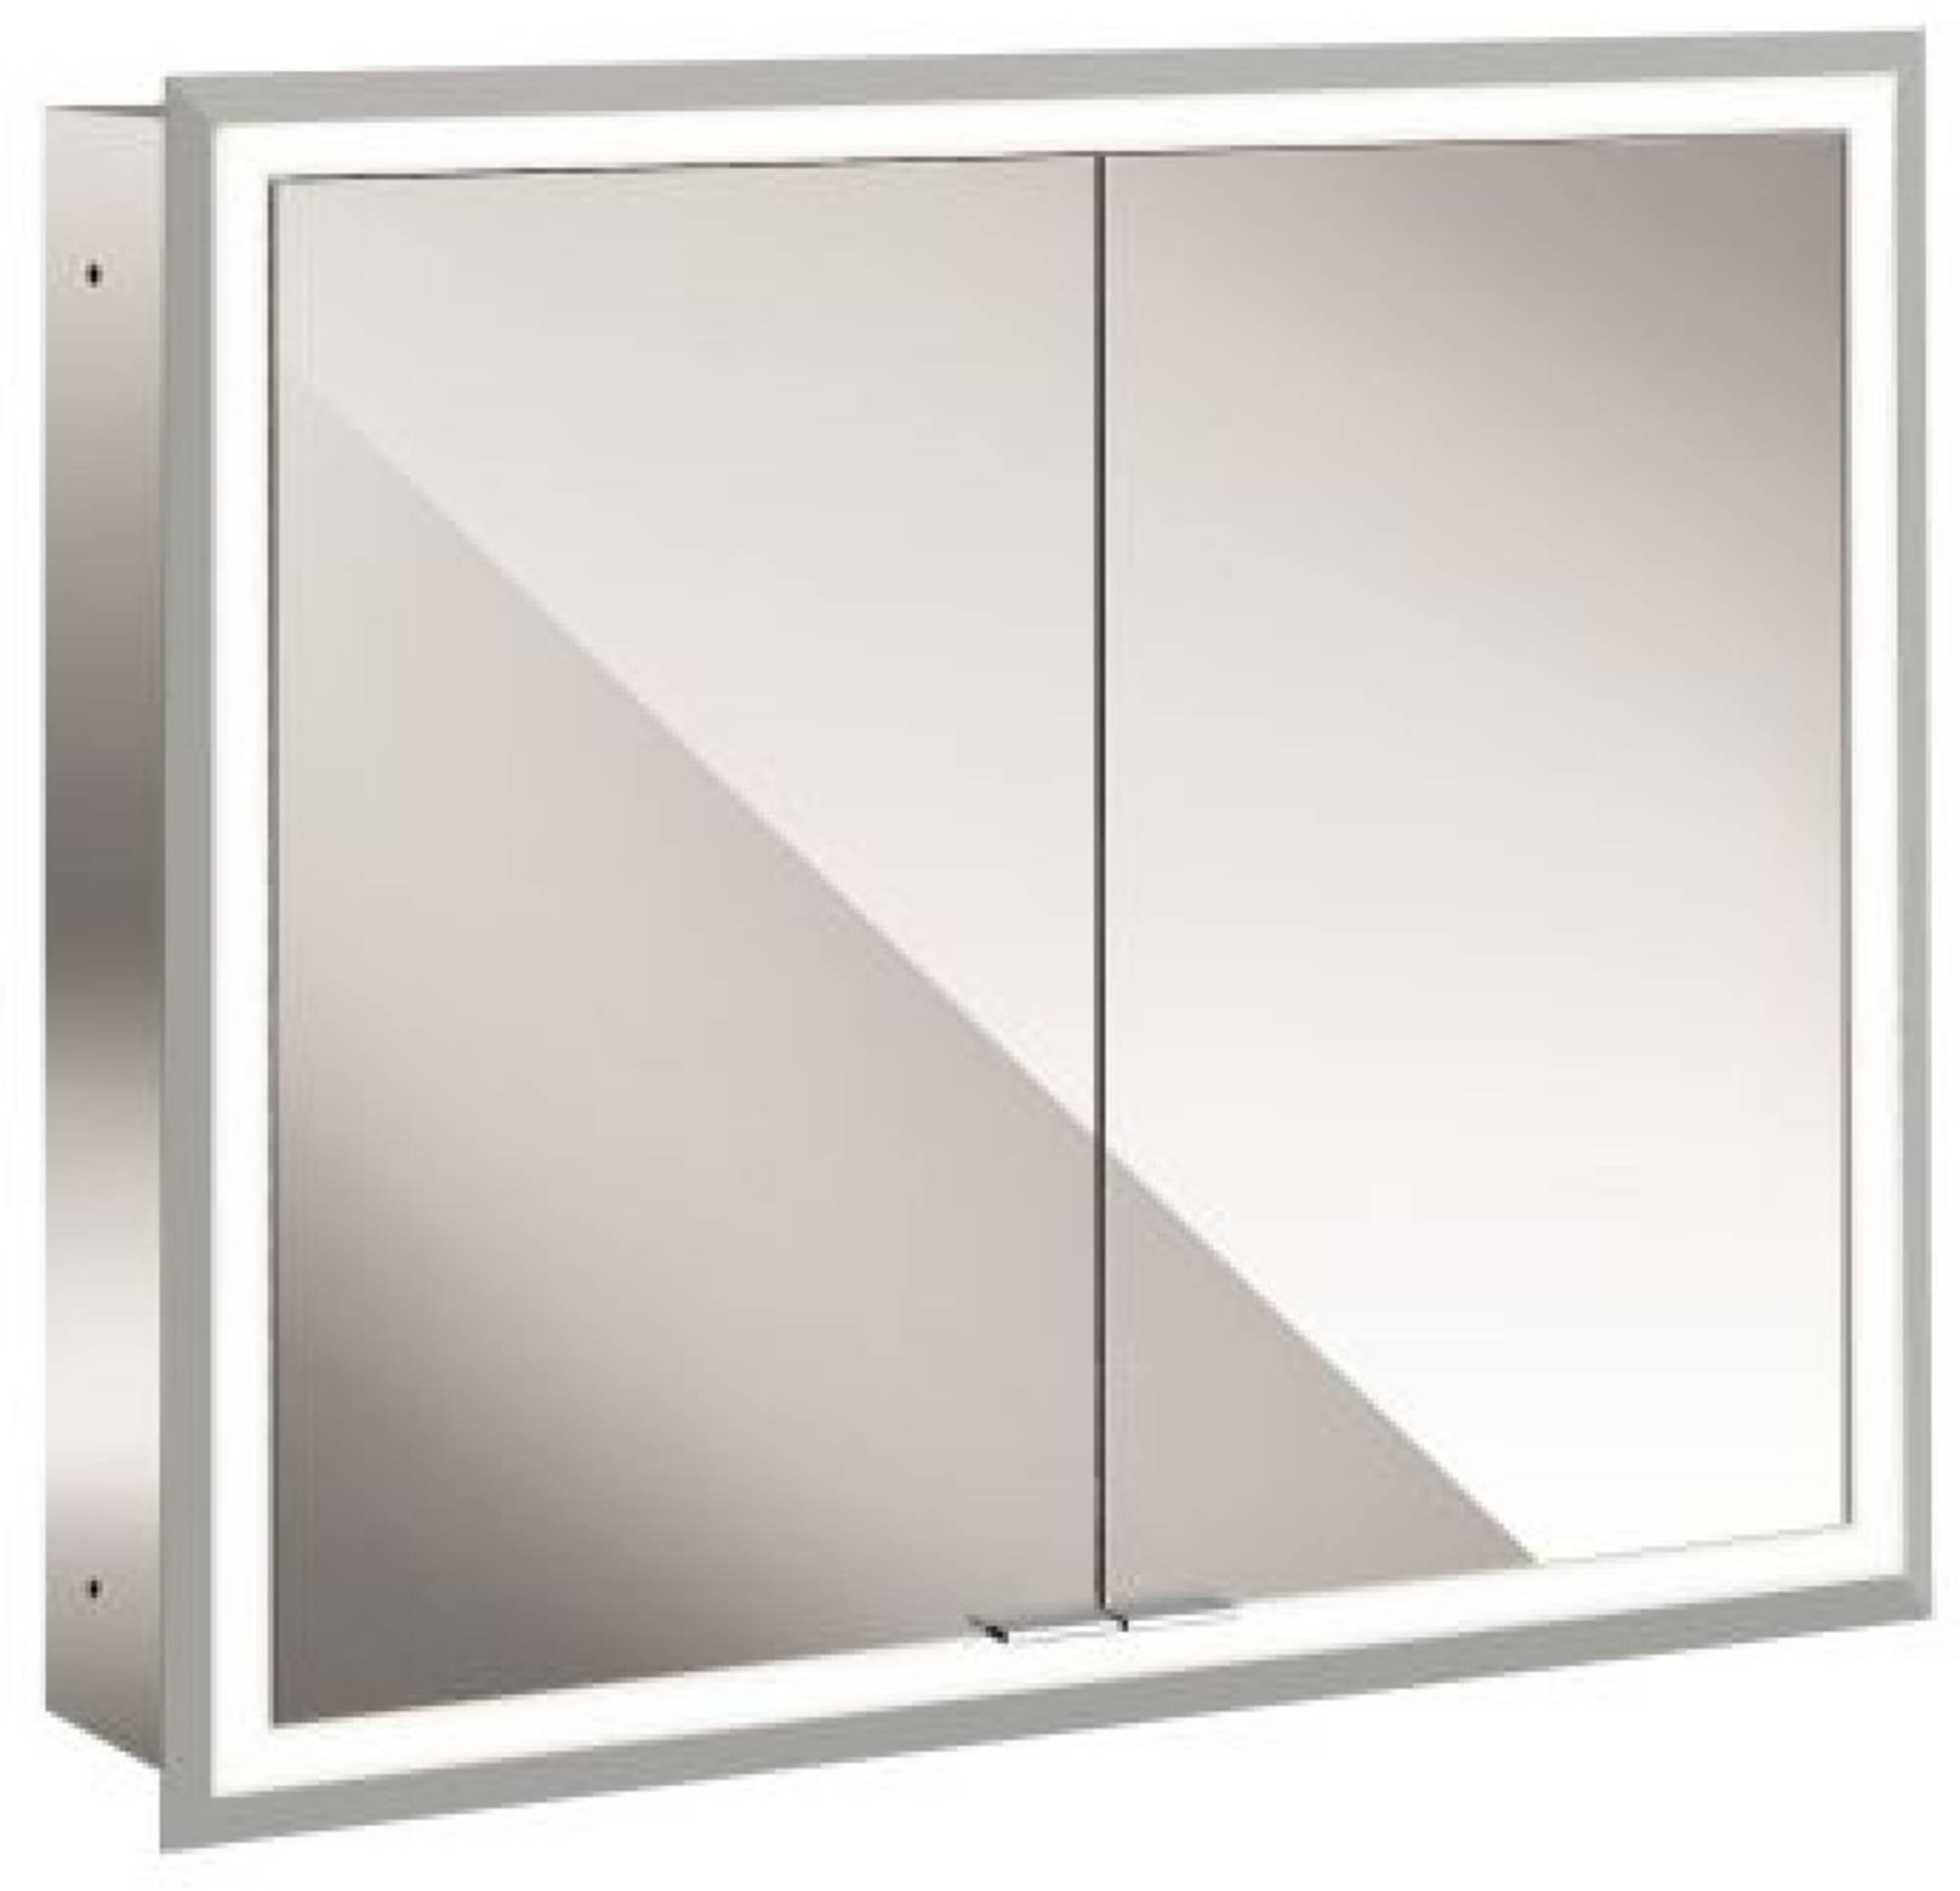 Emco Asis Prime inbouwspiegelkast 830x730 mm met LED witglas